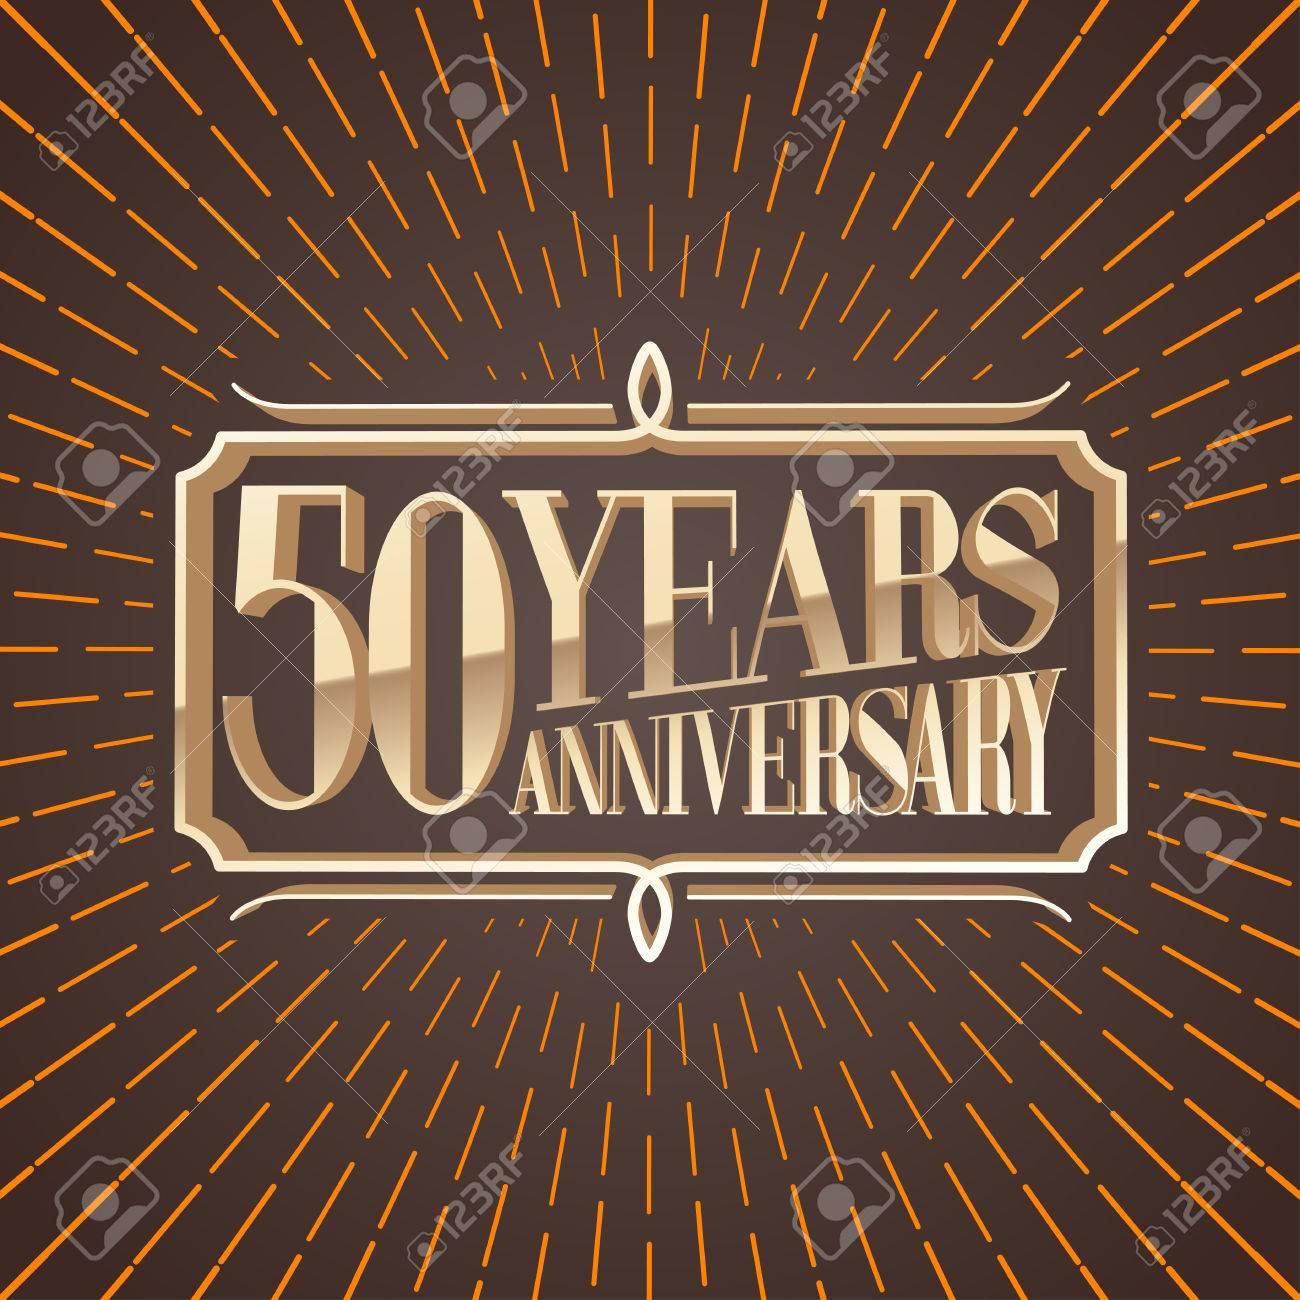 50 Years Anniversary Vector Illustration Icon Logo Decorative Graphic Design Element For 50th